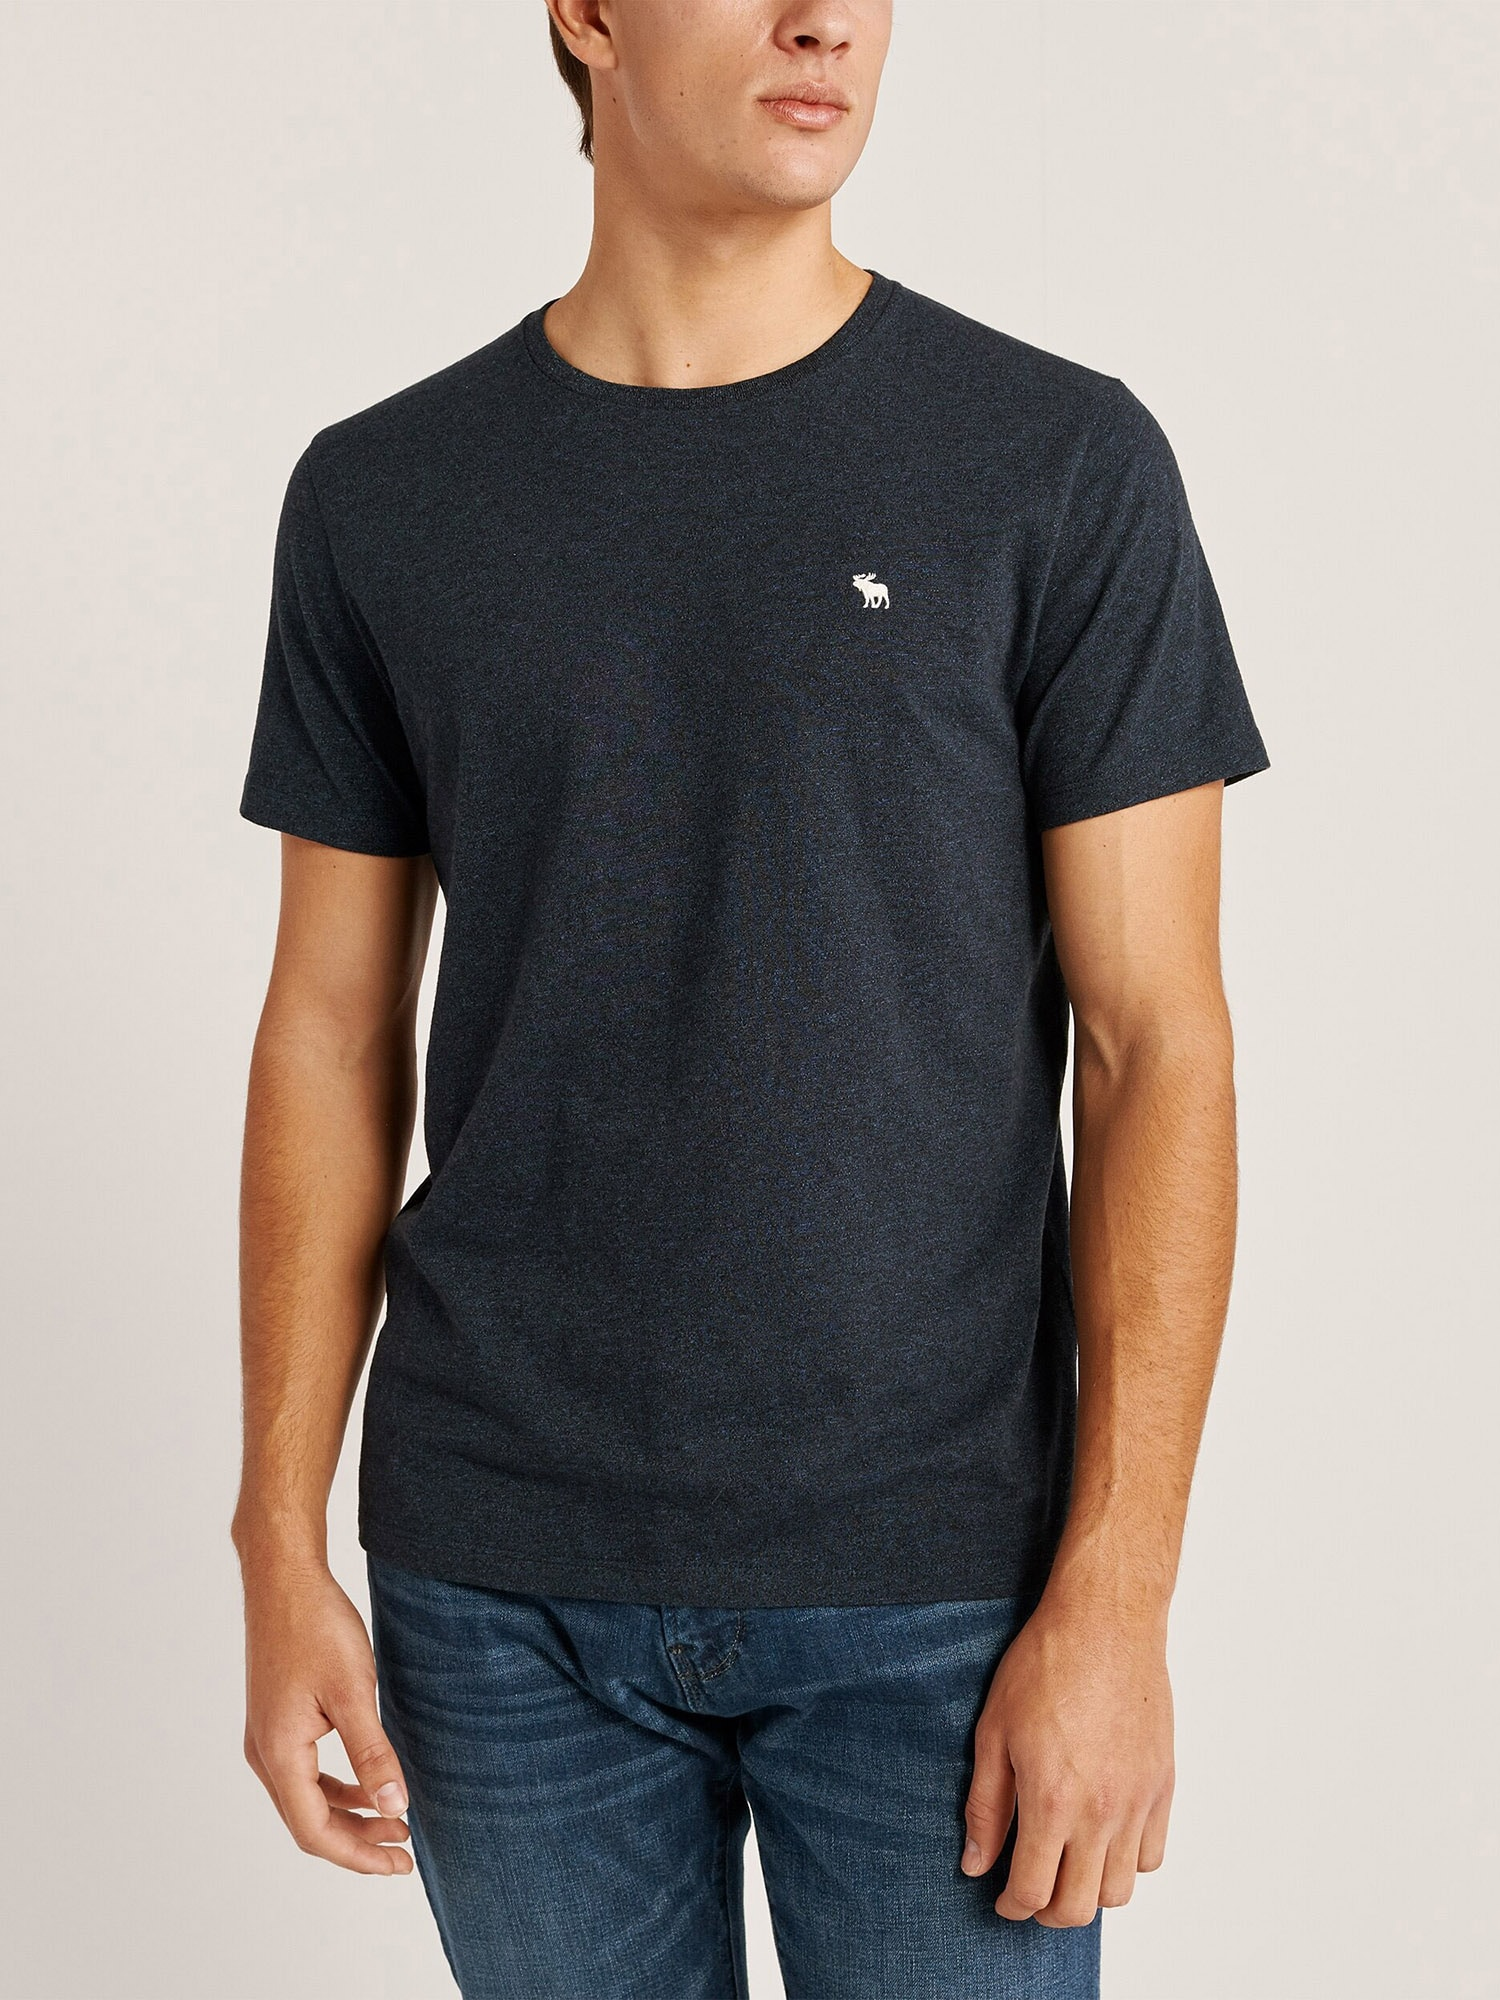 Abercrombie & Fitch T-shirt  marinblå